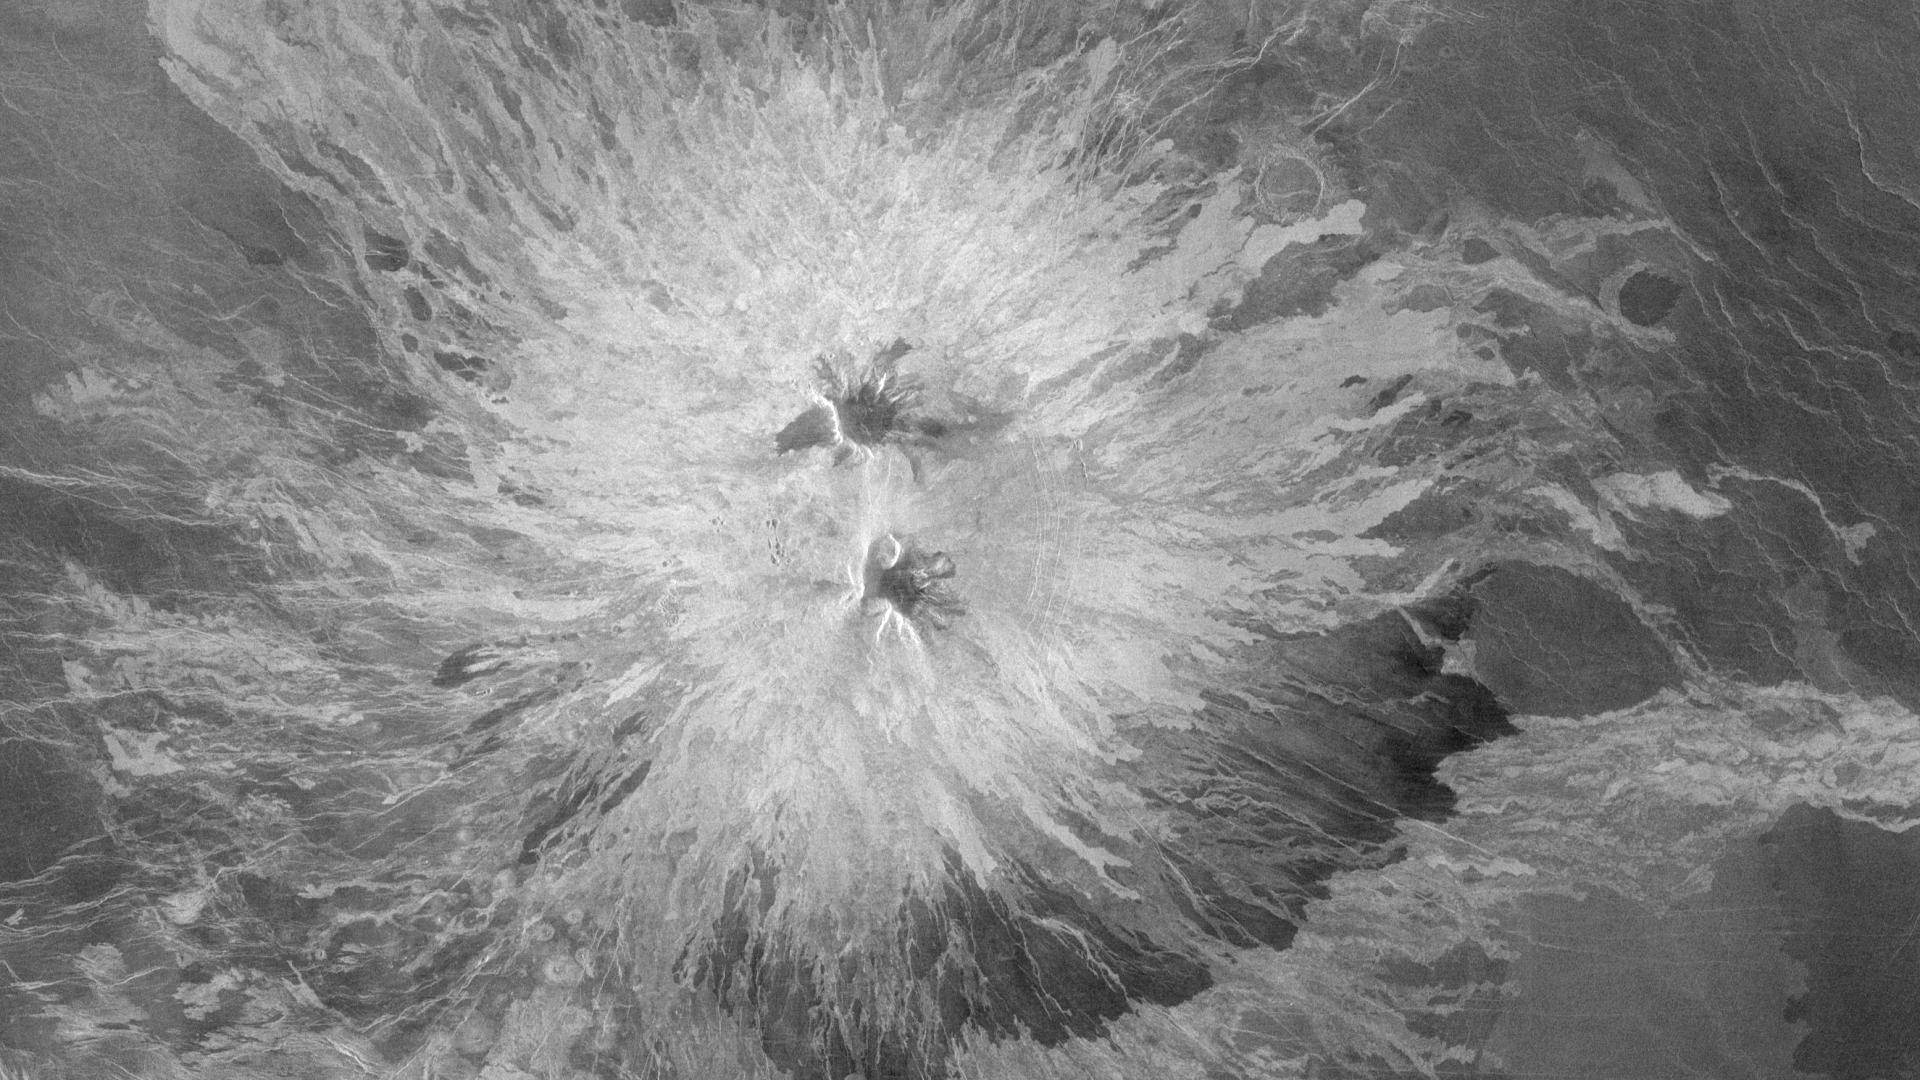 Sapas Mons volcano, Venus